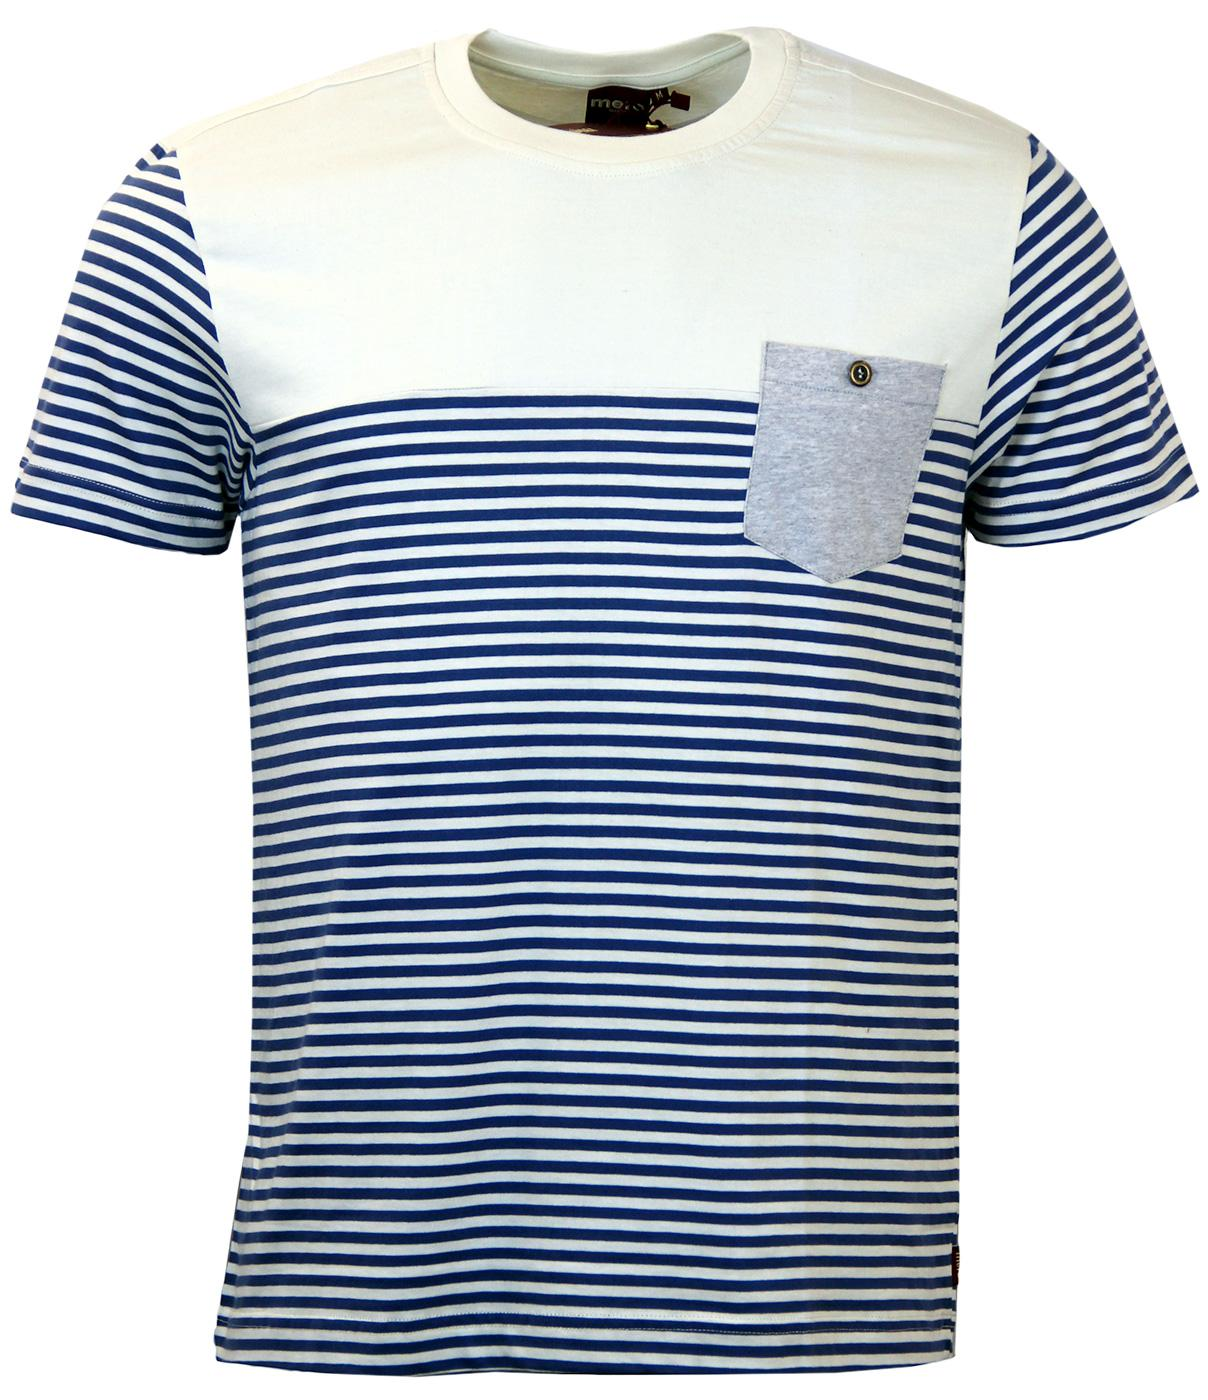 Reuben MERC Retro 60s Nautical Stripe Mod T-Shirt